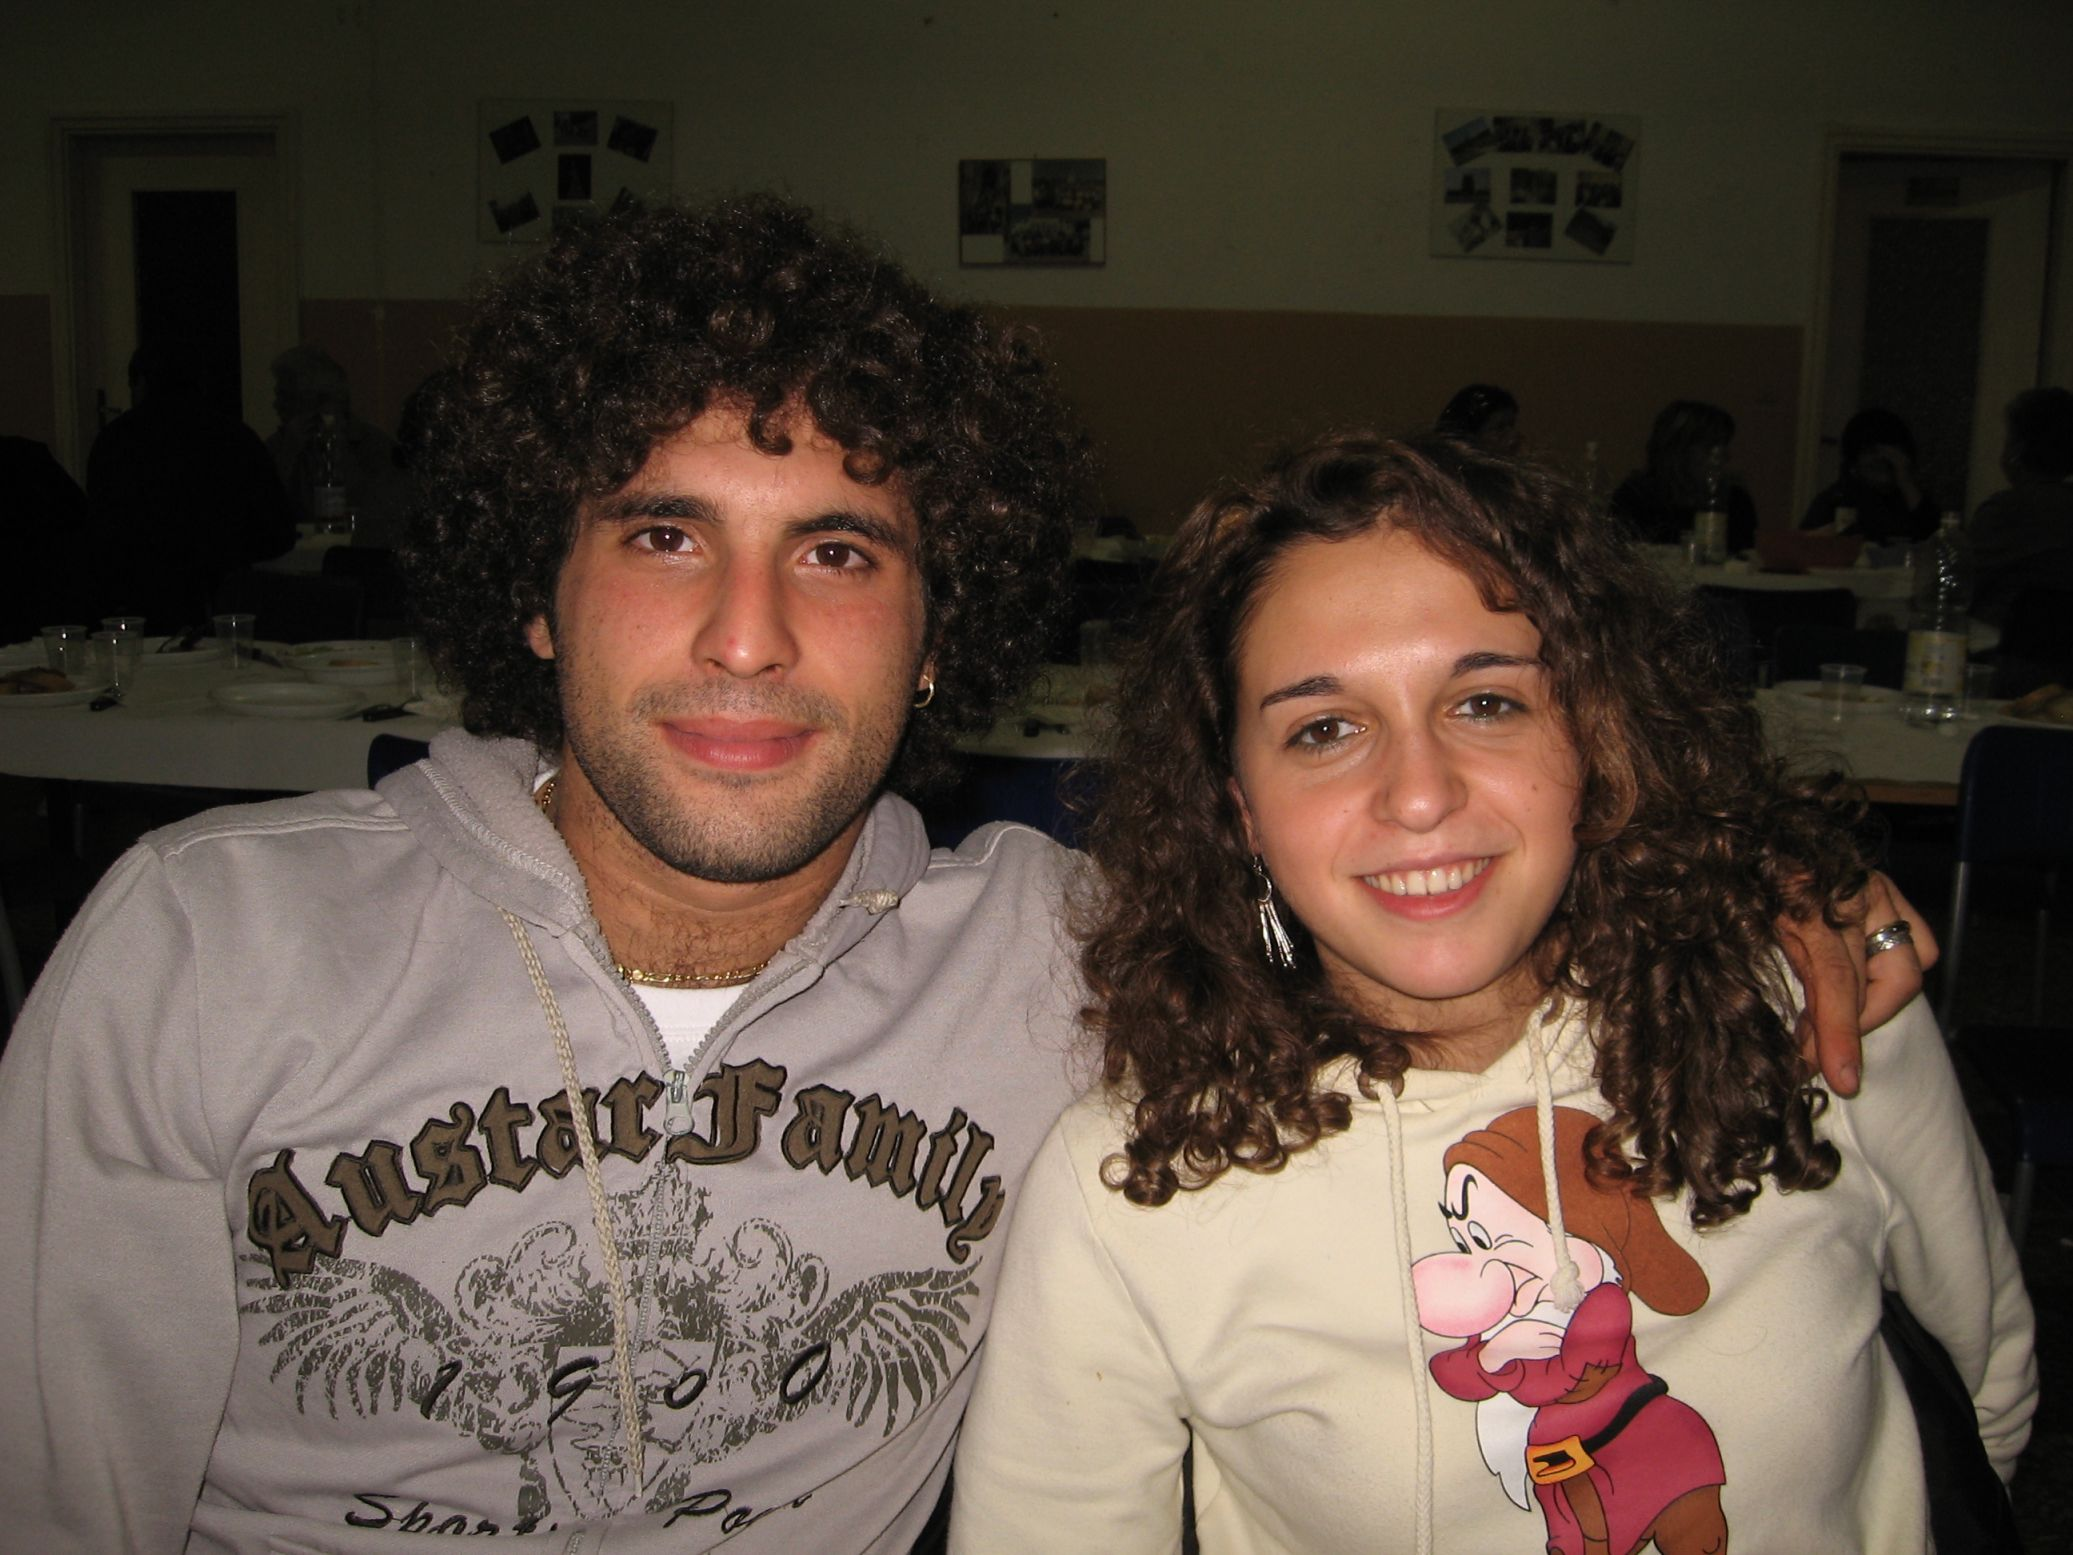 Cena_Famiglie_Giovani-2009-11-21--21.35.20